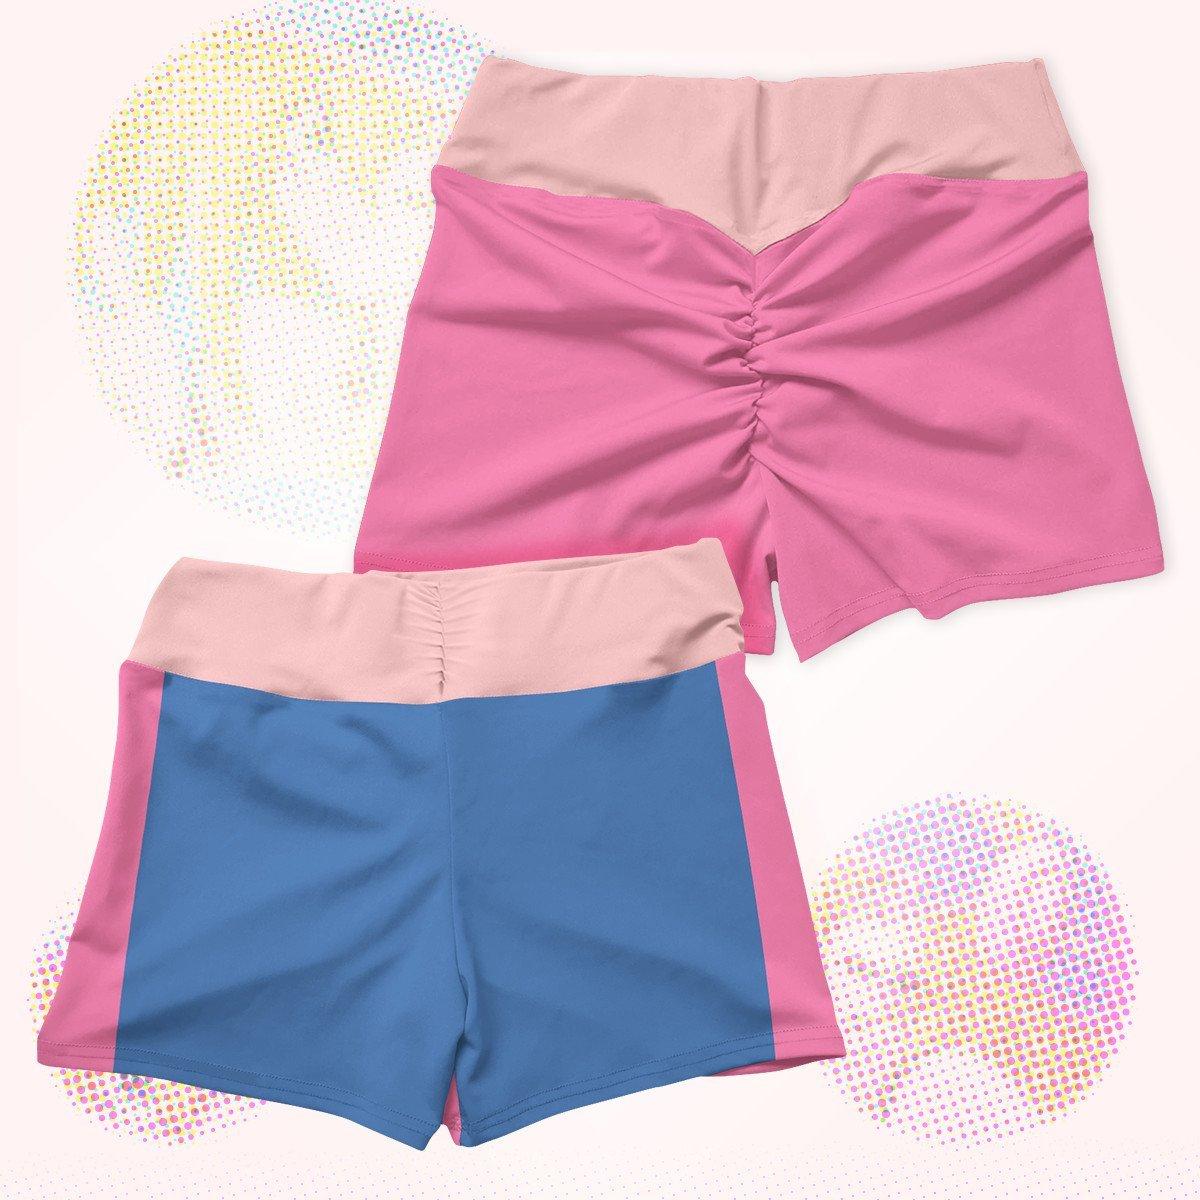 dark magician girl active wear set 931828 - Anime Swimsuits